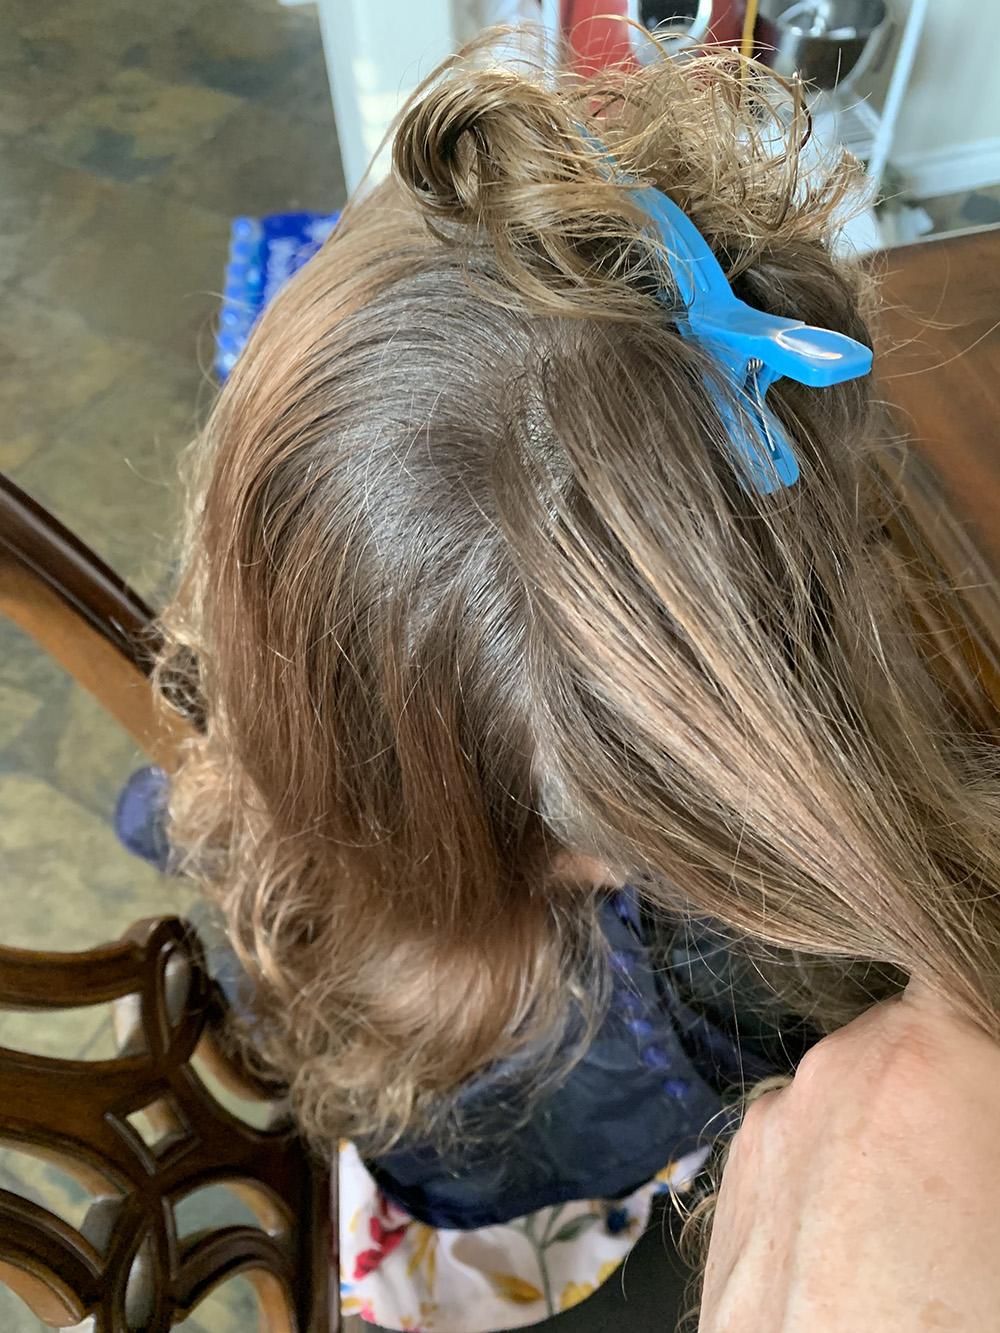 Lice Treatment in Temecula and Murrieta, CA